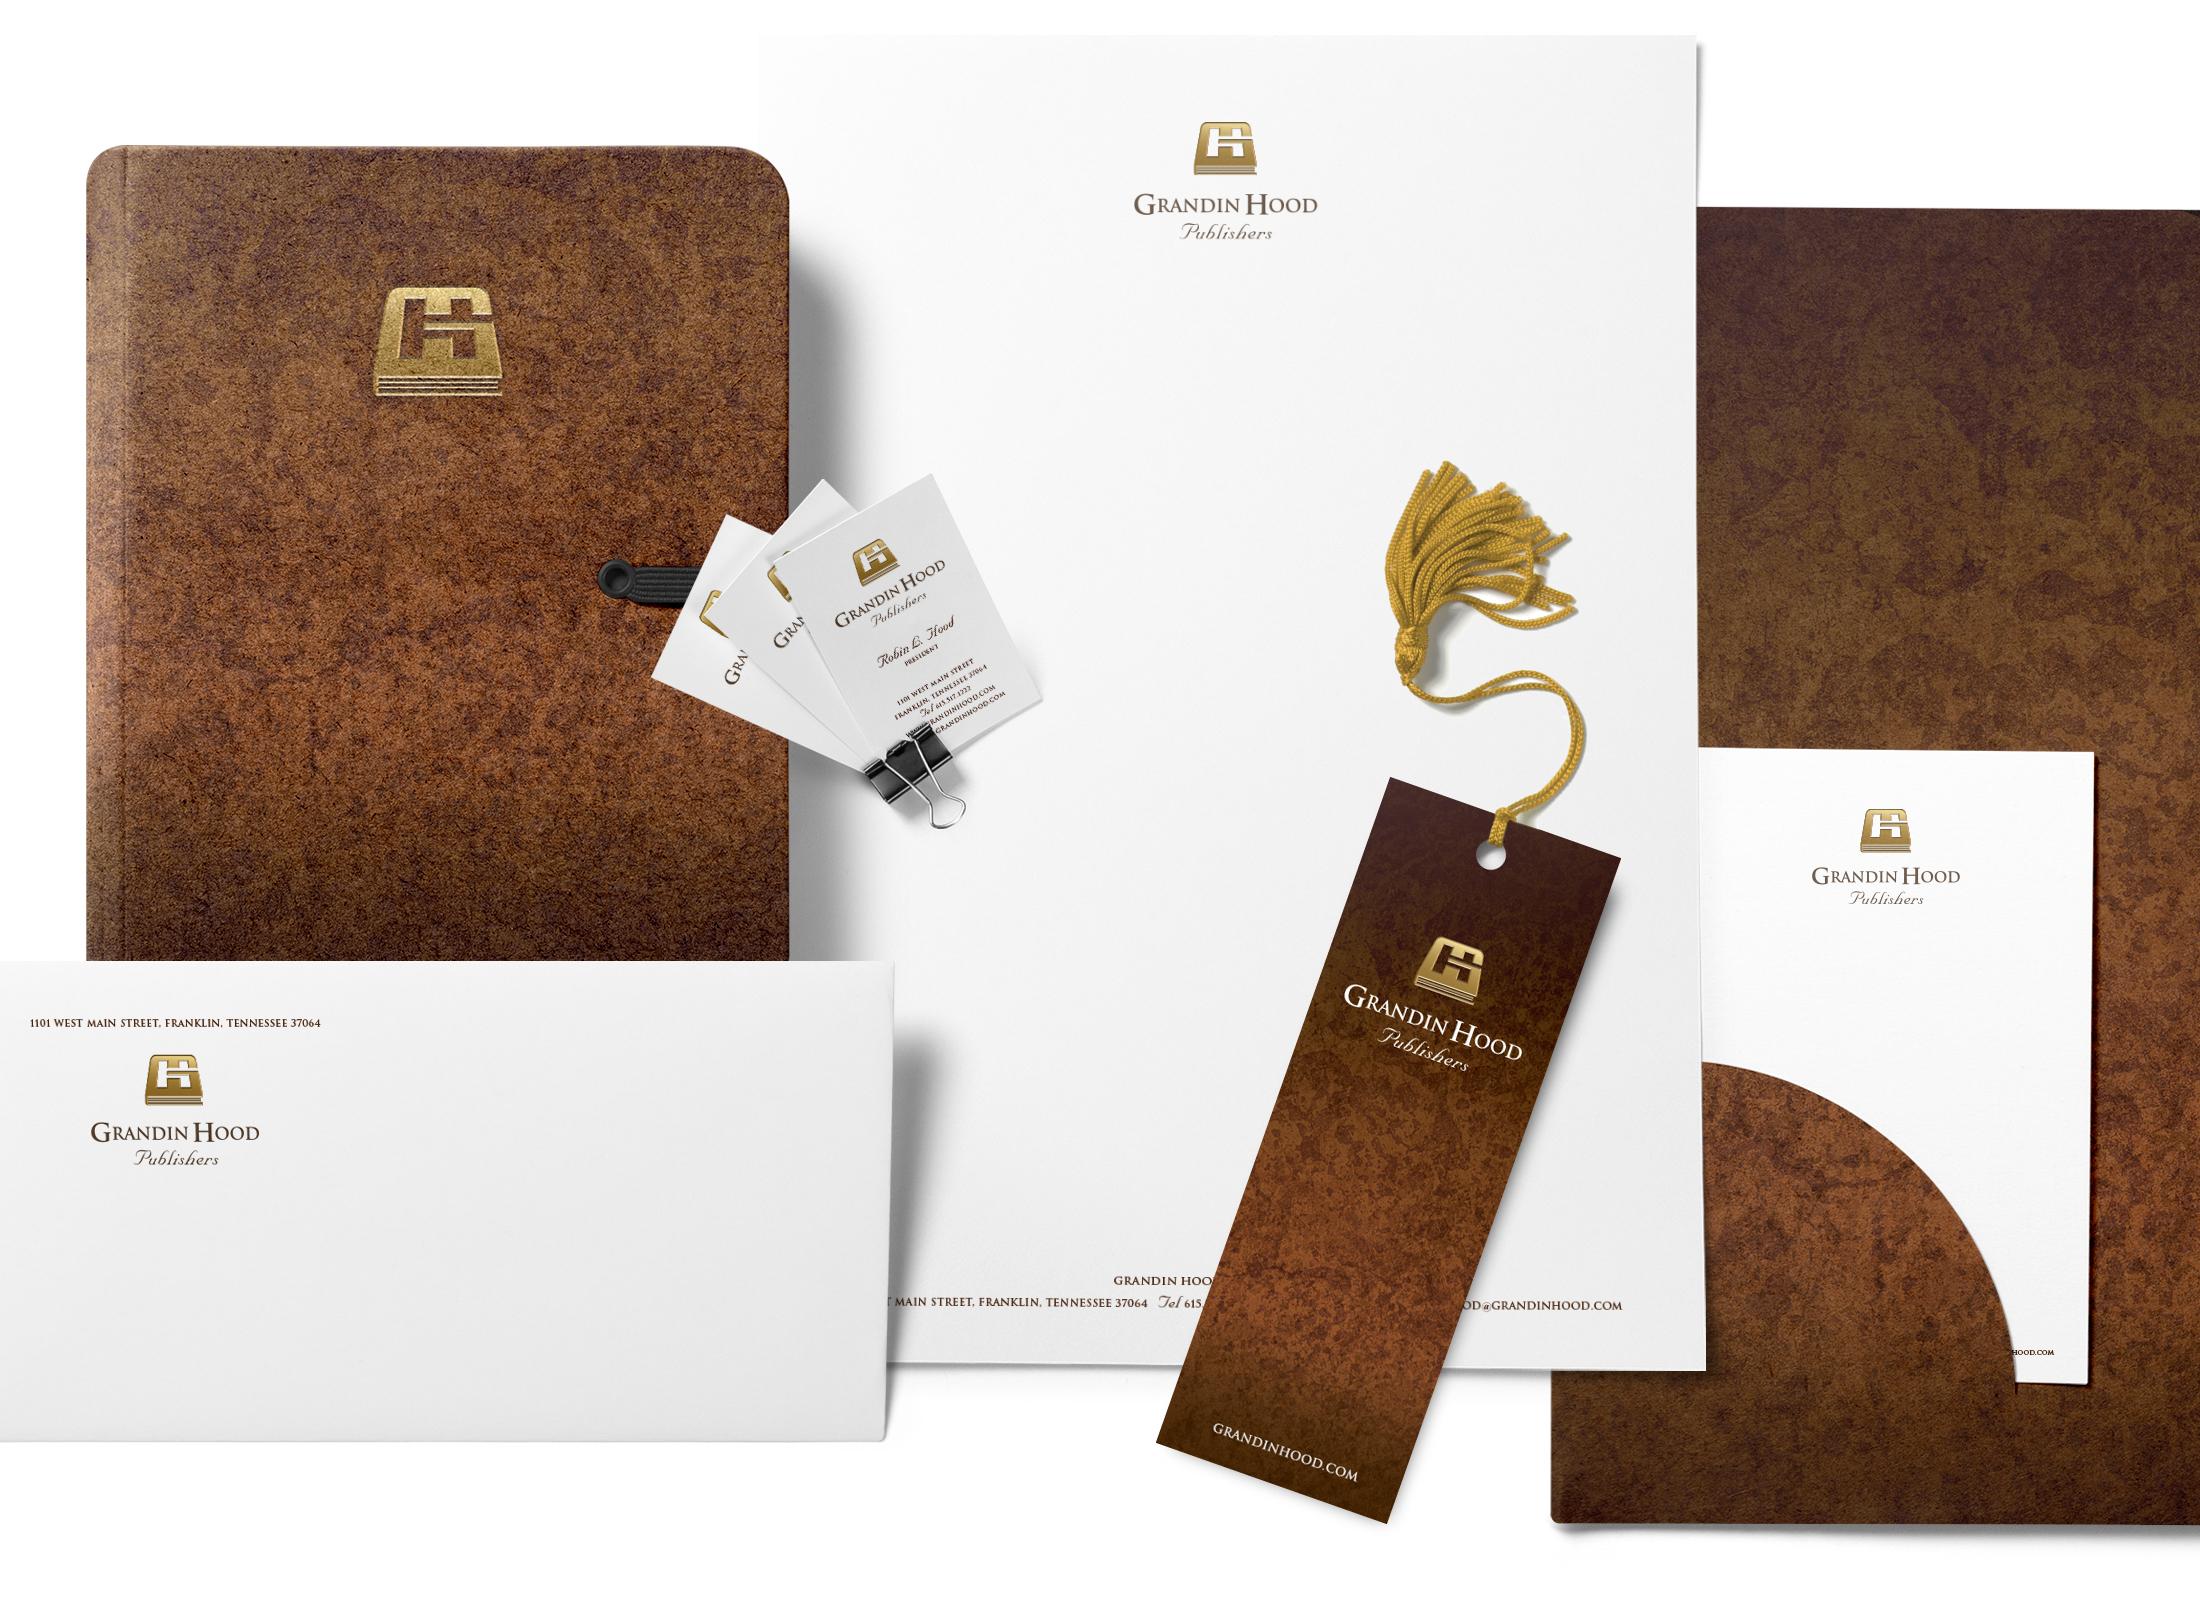 Grandin Hood Stationery © Robertson Design